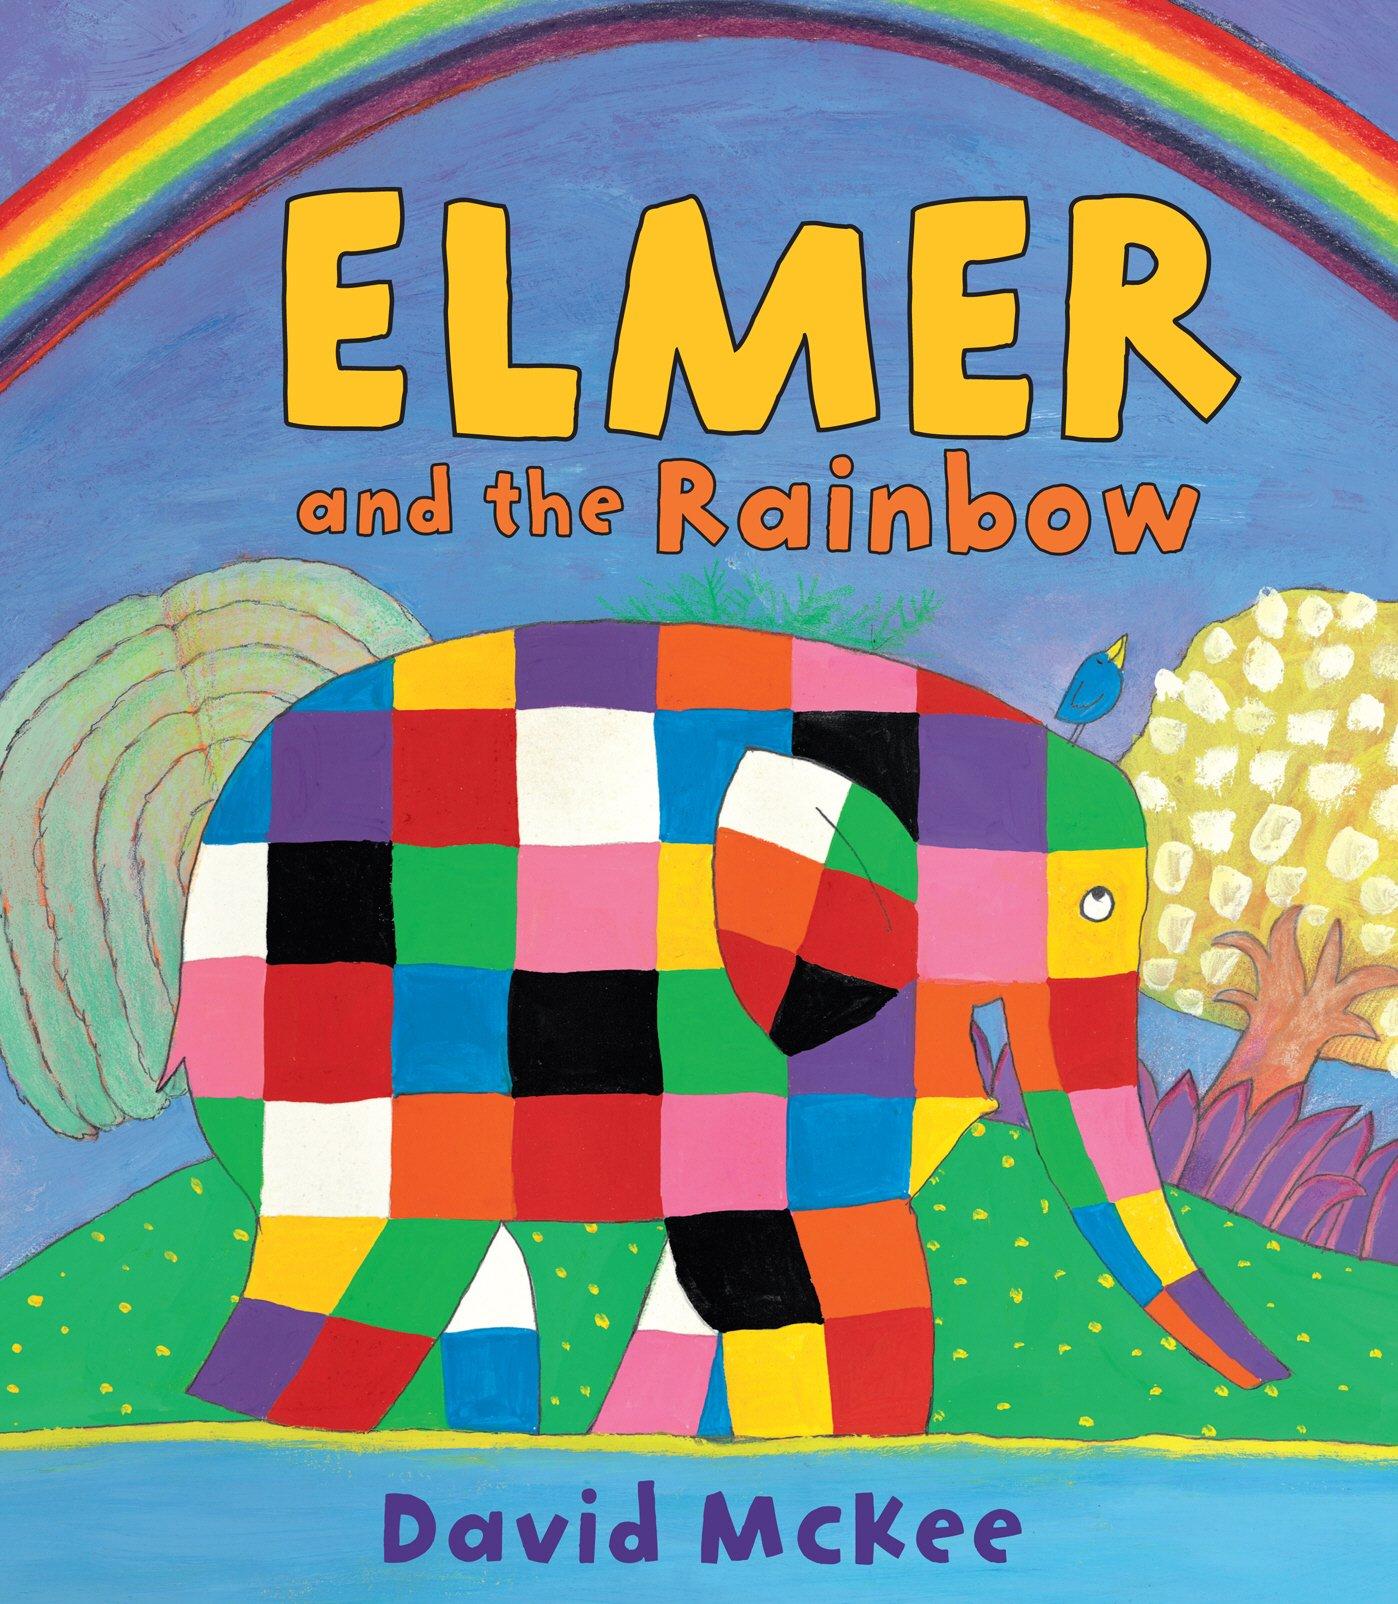 amazon elmer and the rainbow elmer picture books david mckee